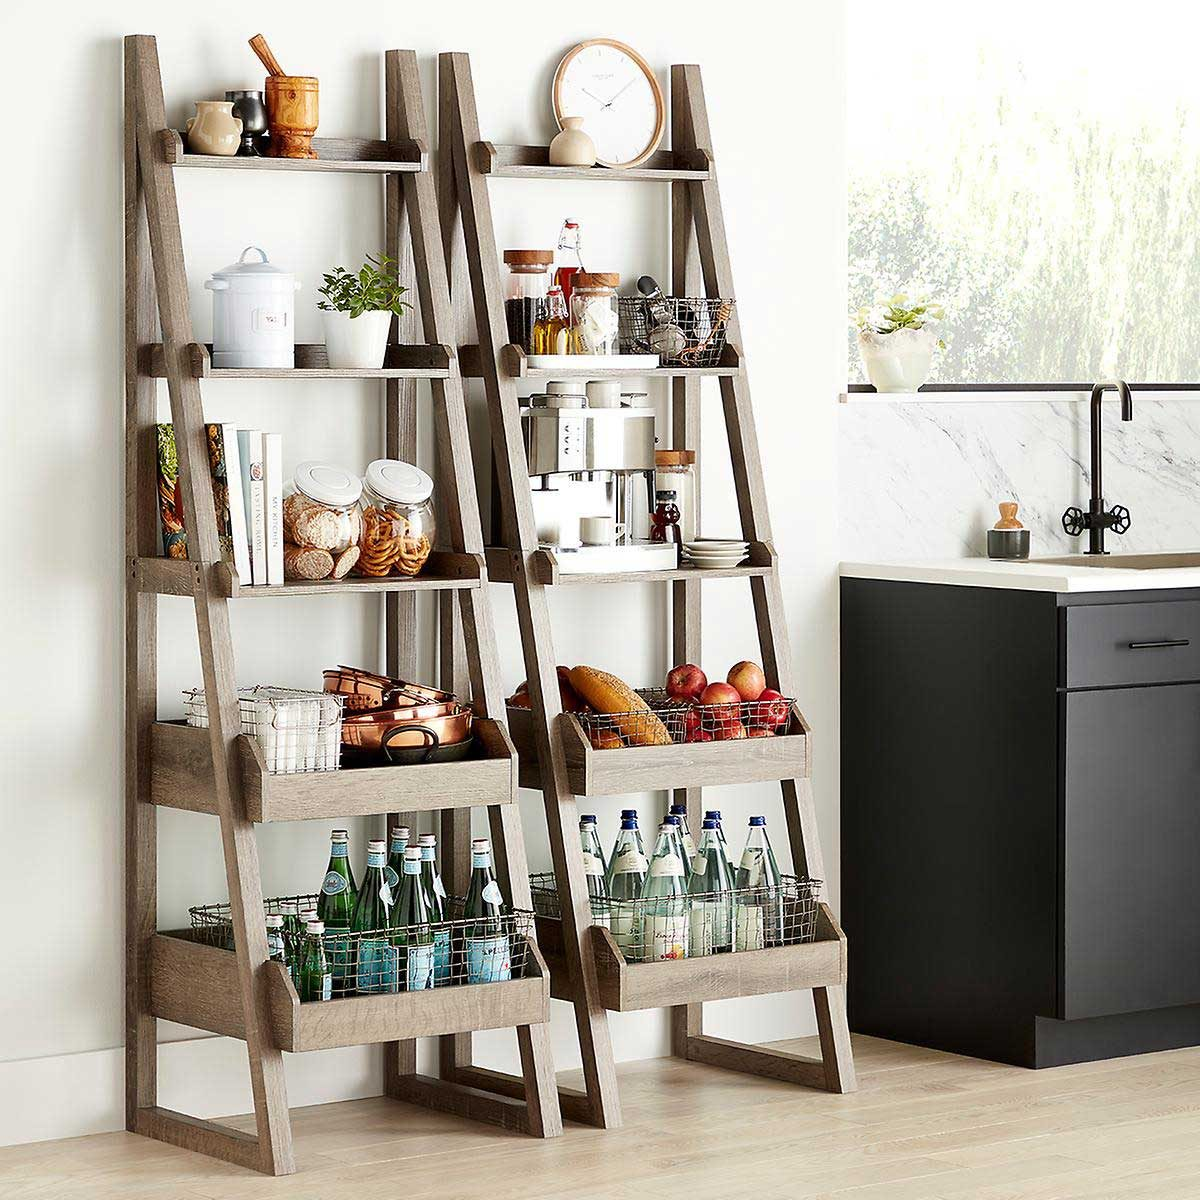 Storage Shelves Sh 18 Solid Wood Folding Tower V2 Rg